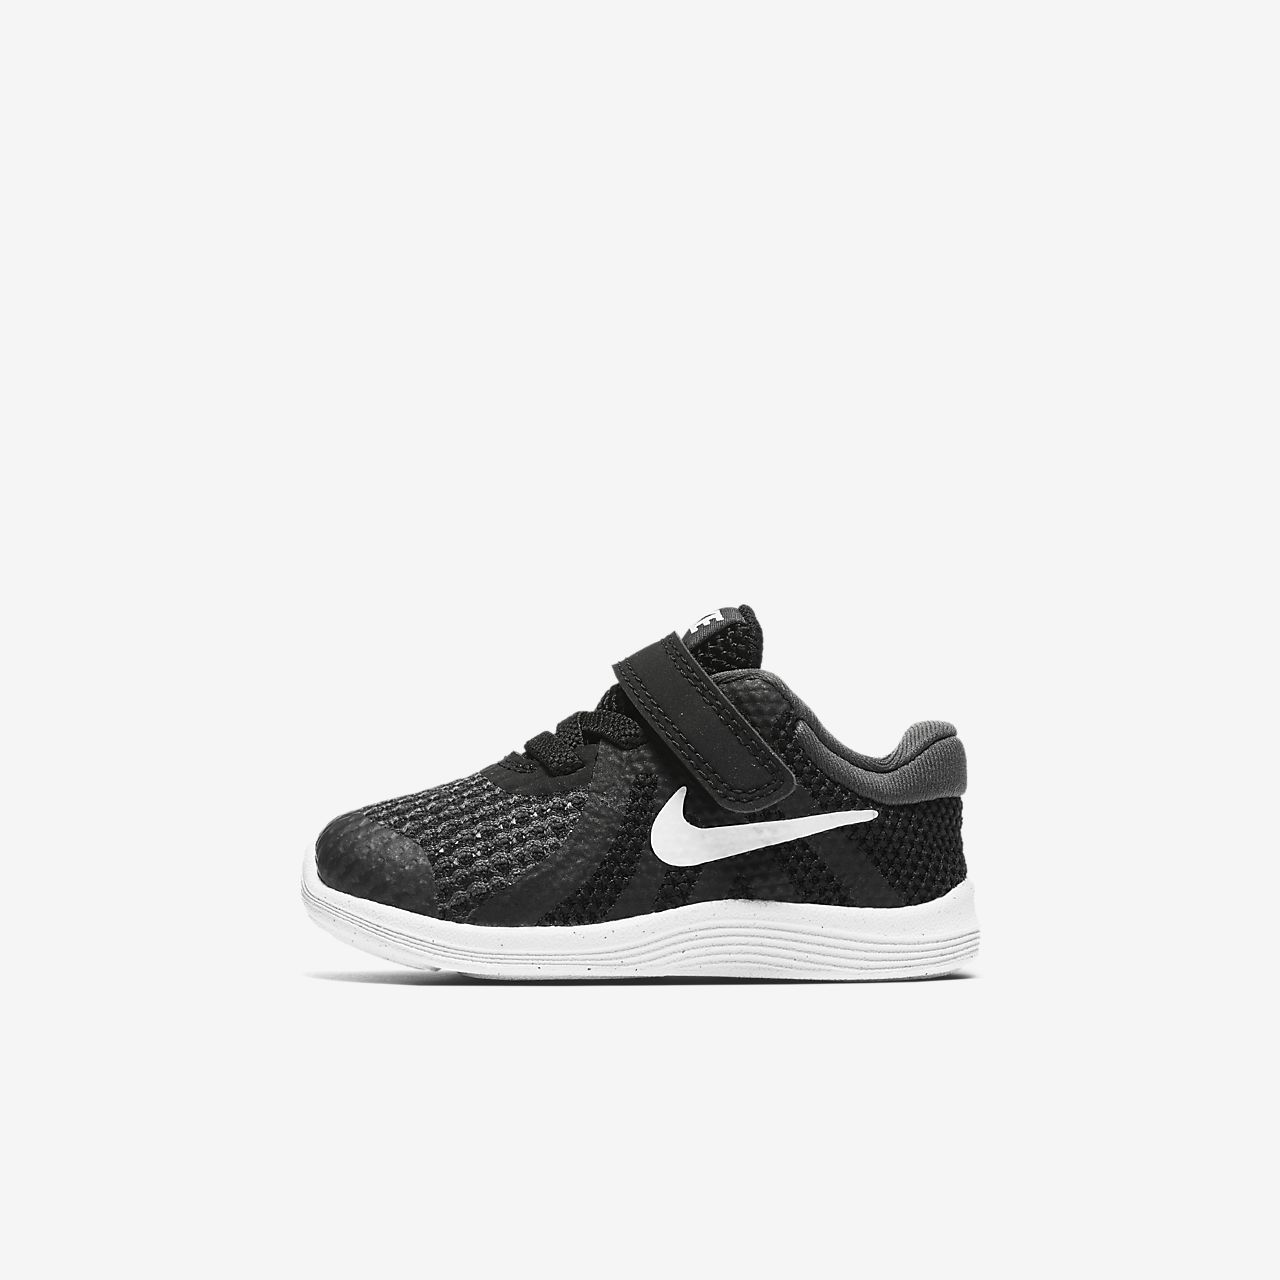 Sko Nike Revolution 4 f?r babysm? barn